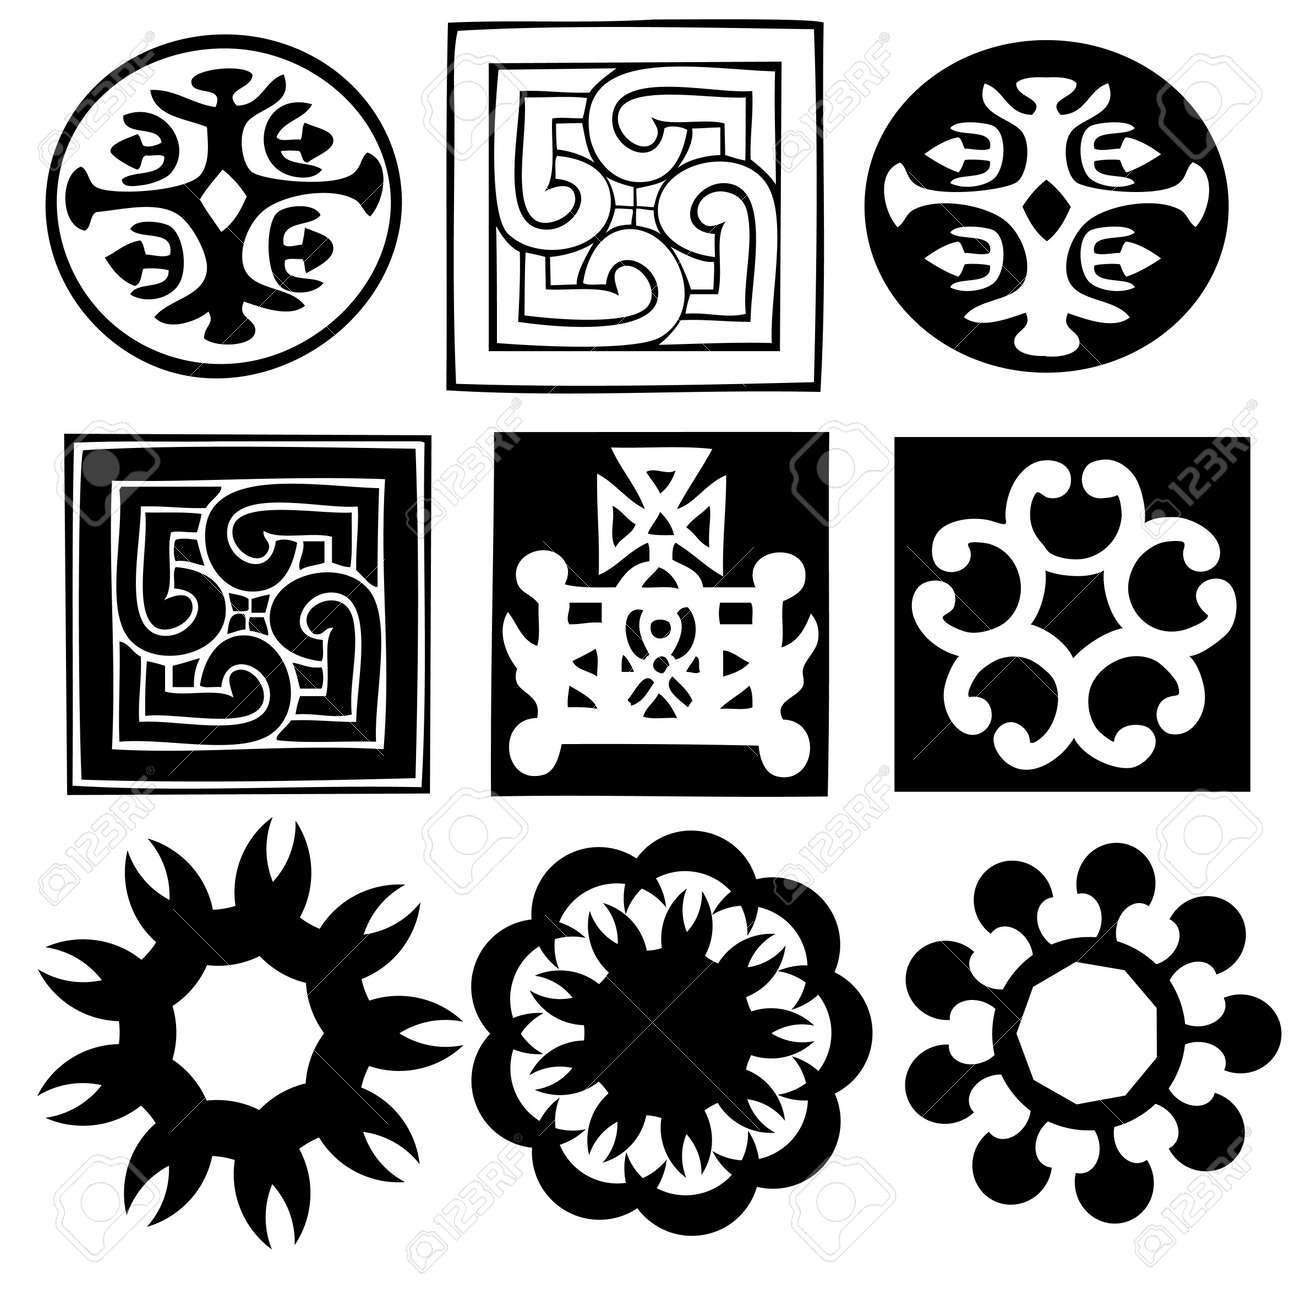 Various ornaments abstract symbols vector royalty free various ornaments abstract symbols vector stock vector 11663935 buycottarizona